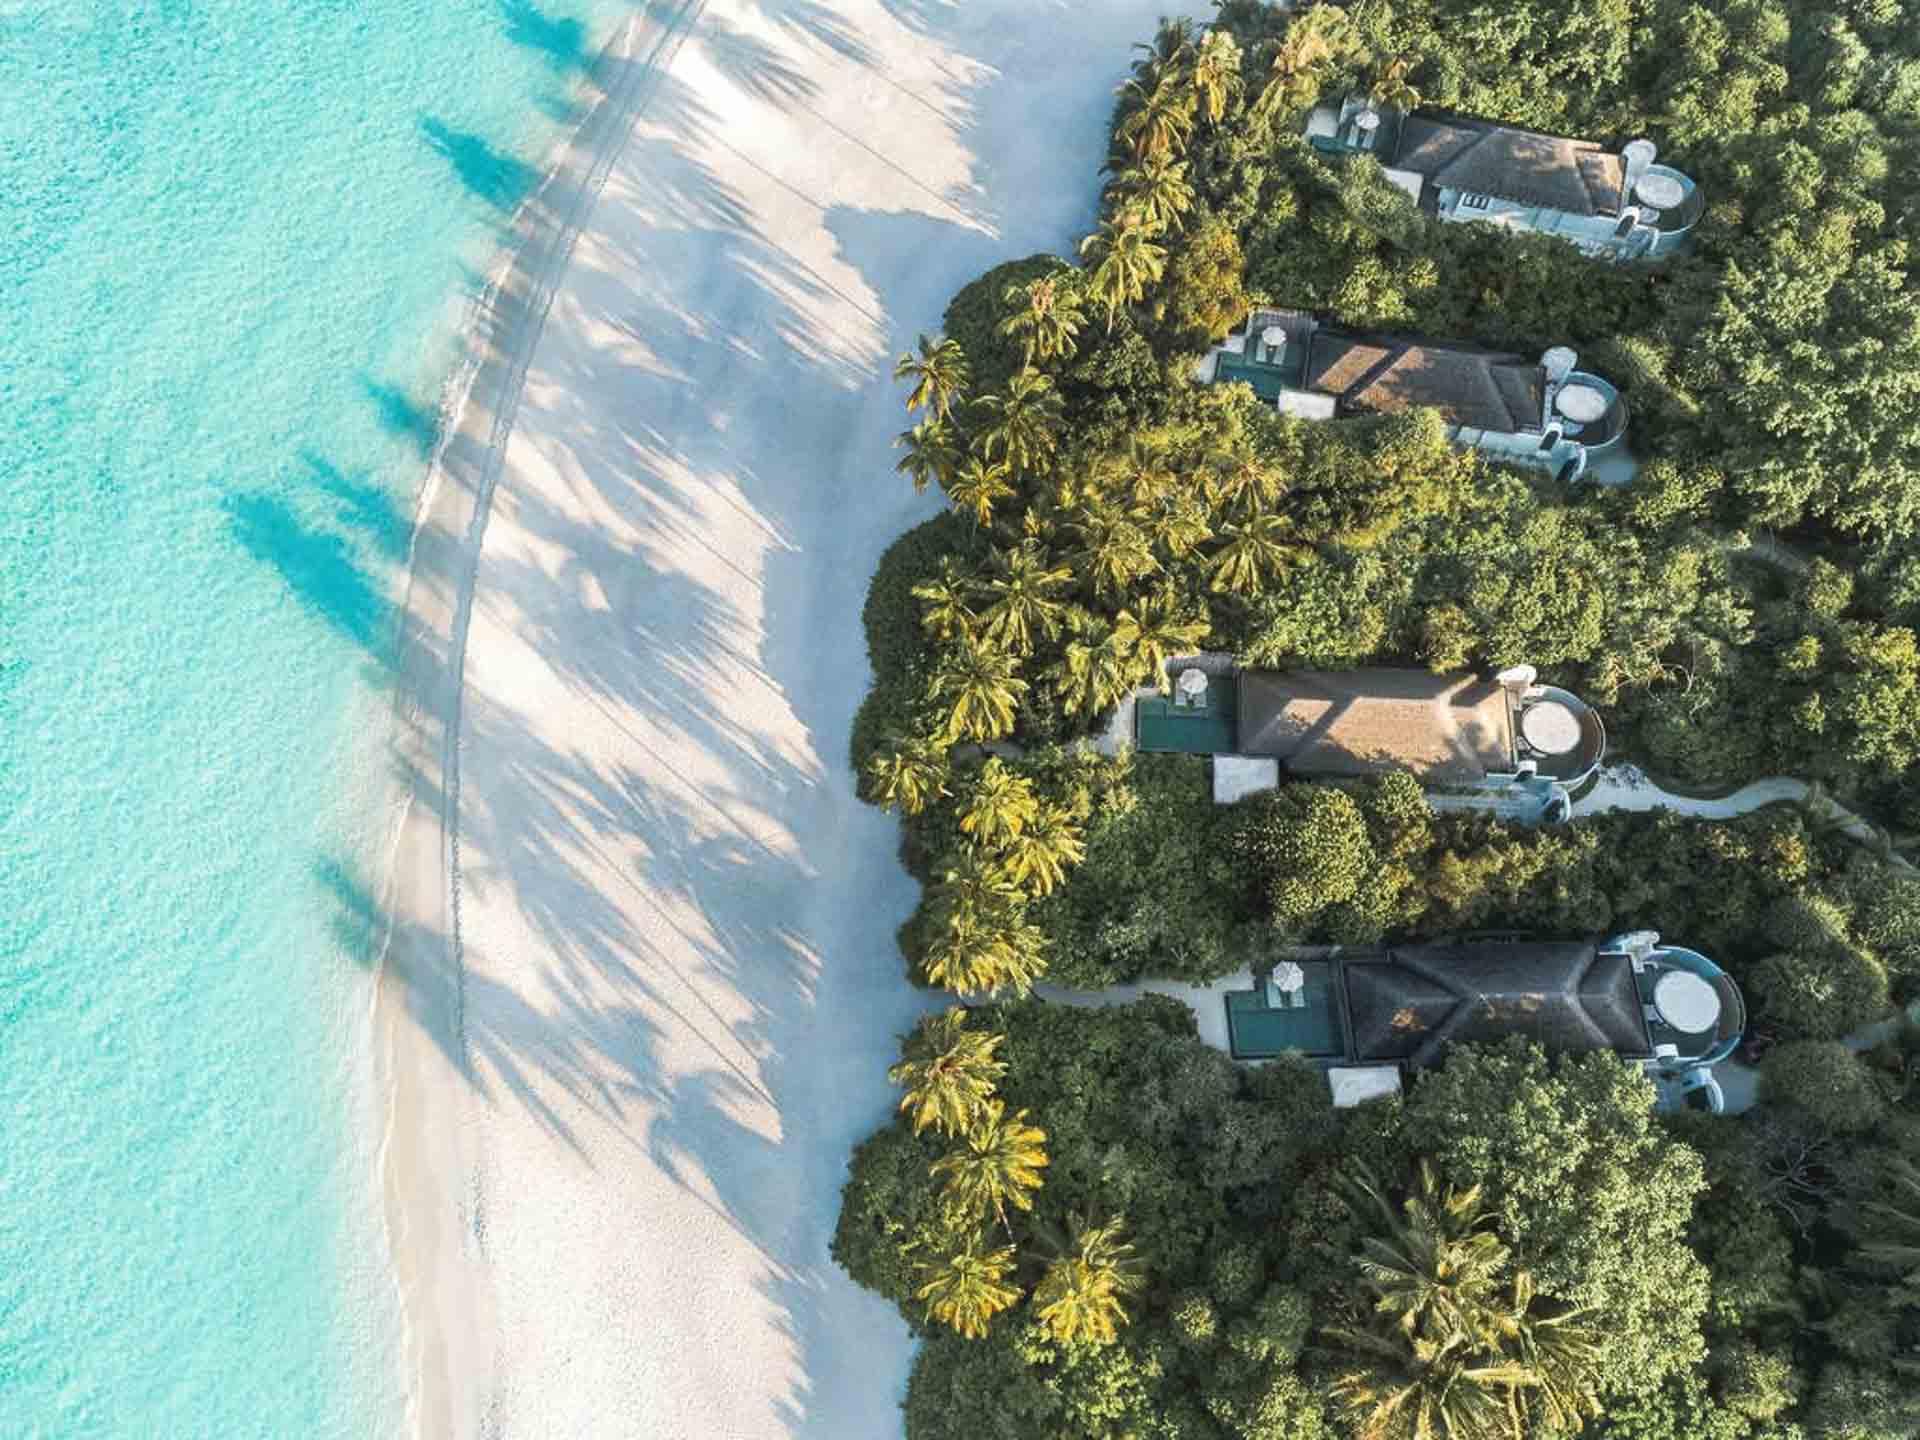 Beach villas in a luxury resort